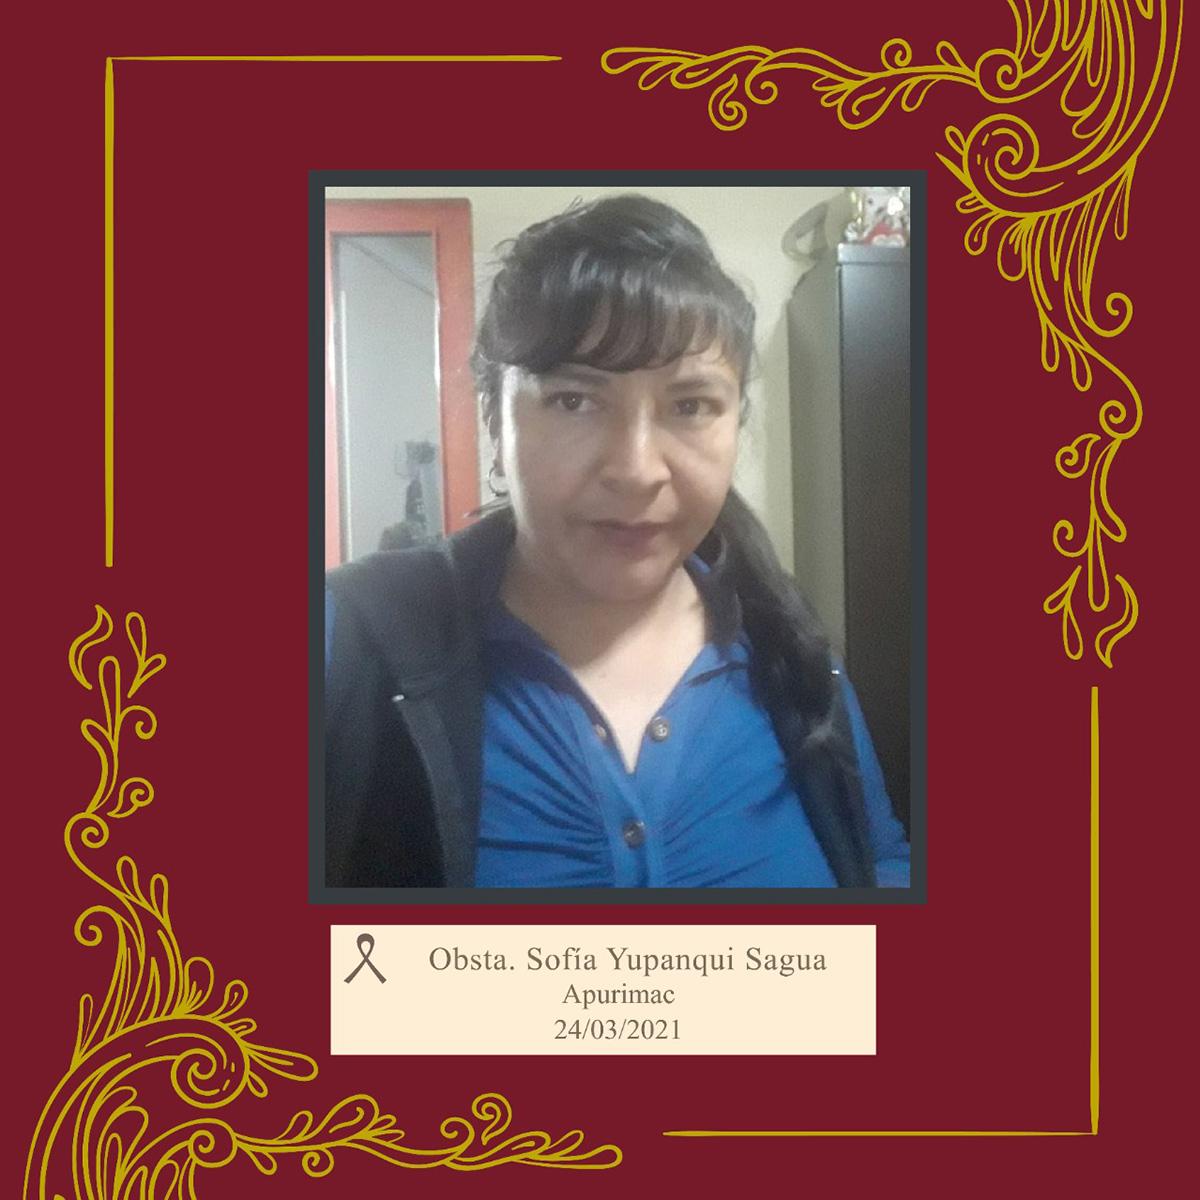 Sofía Esperanza Yupanqui Sagua